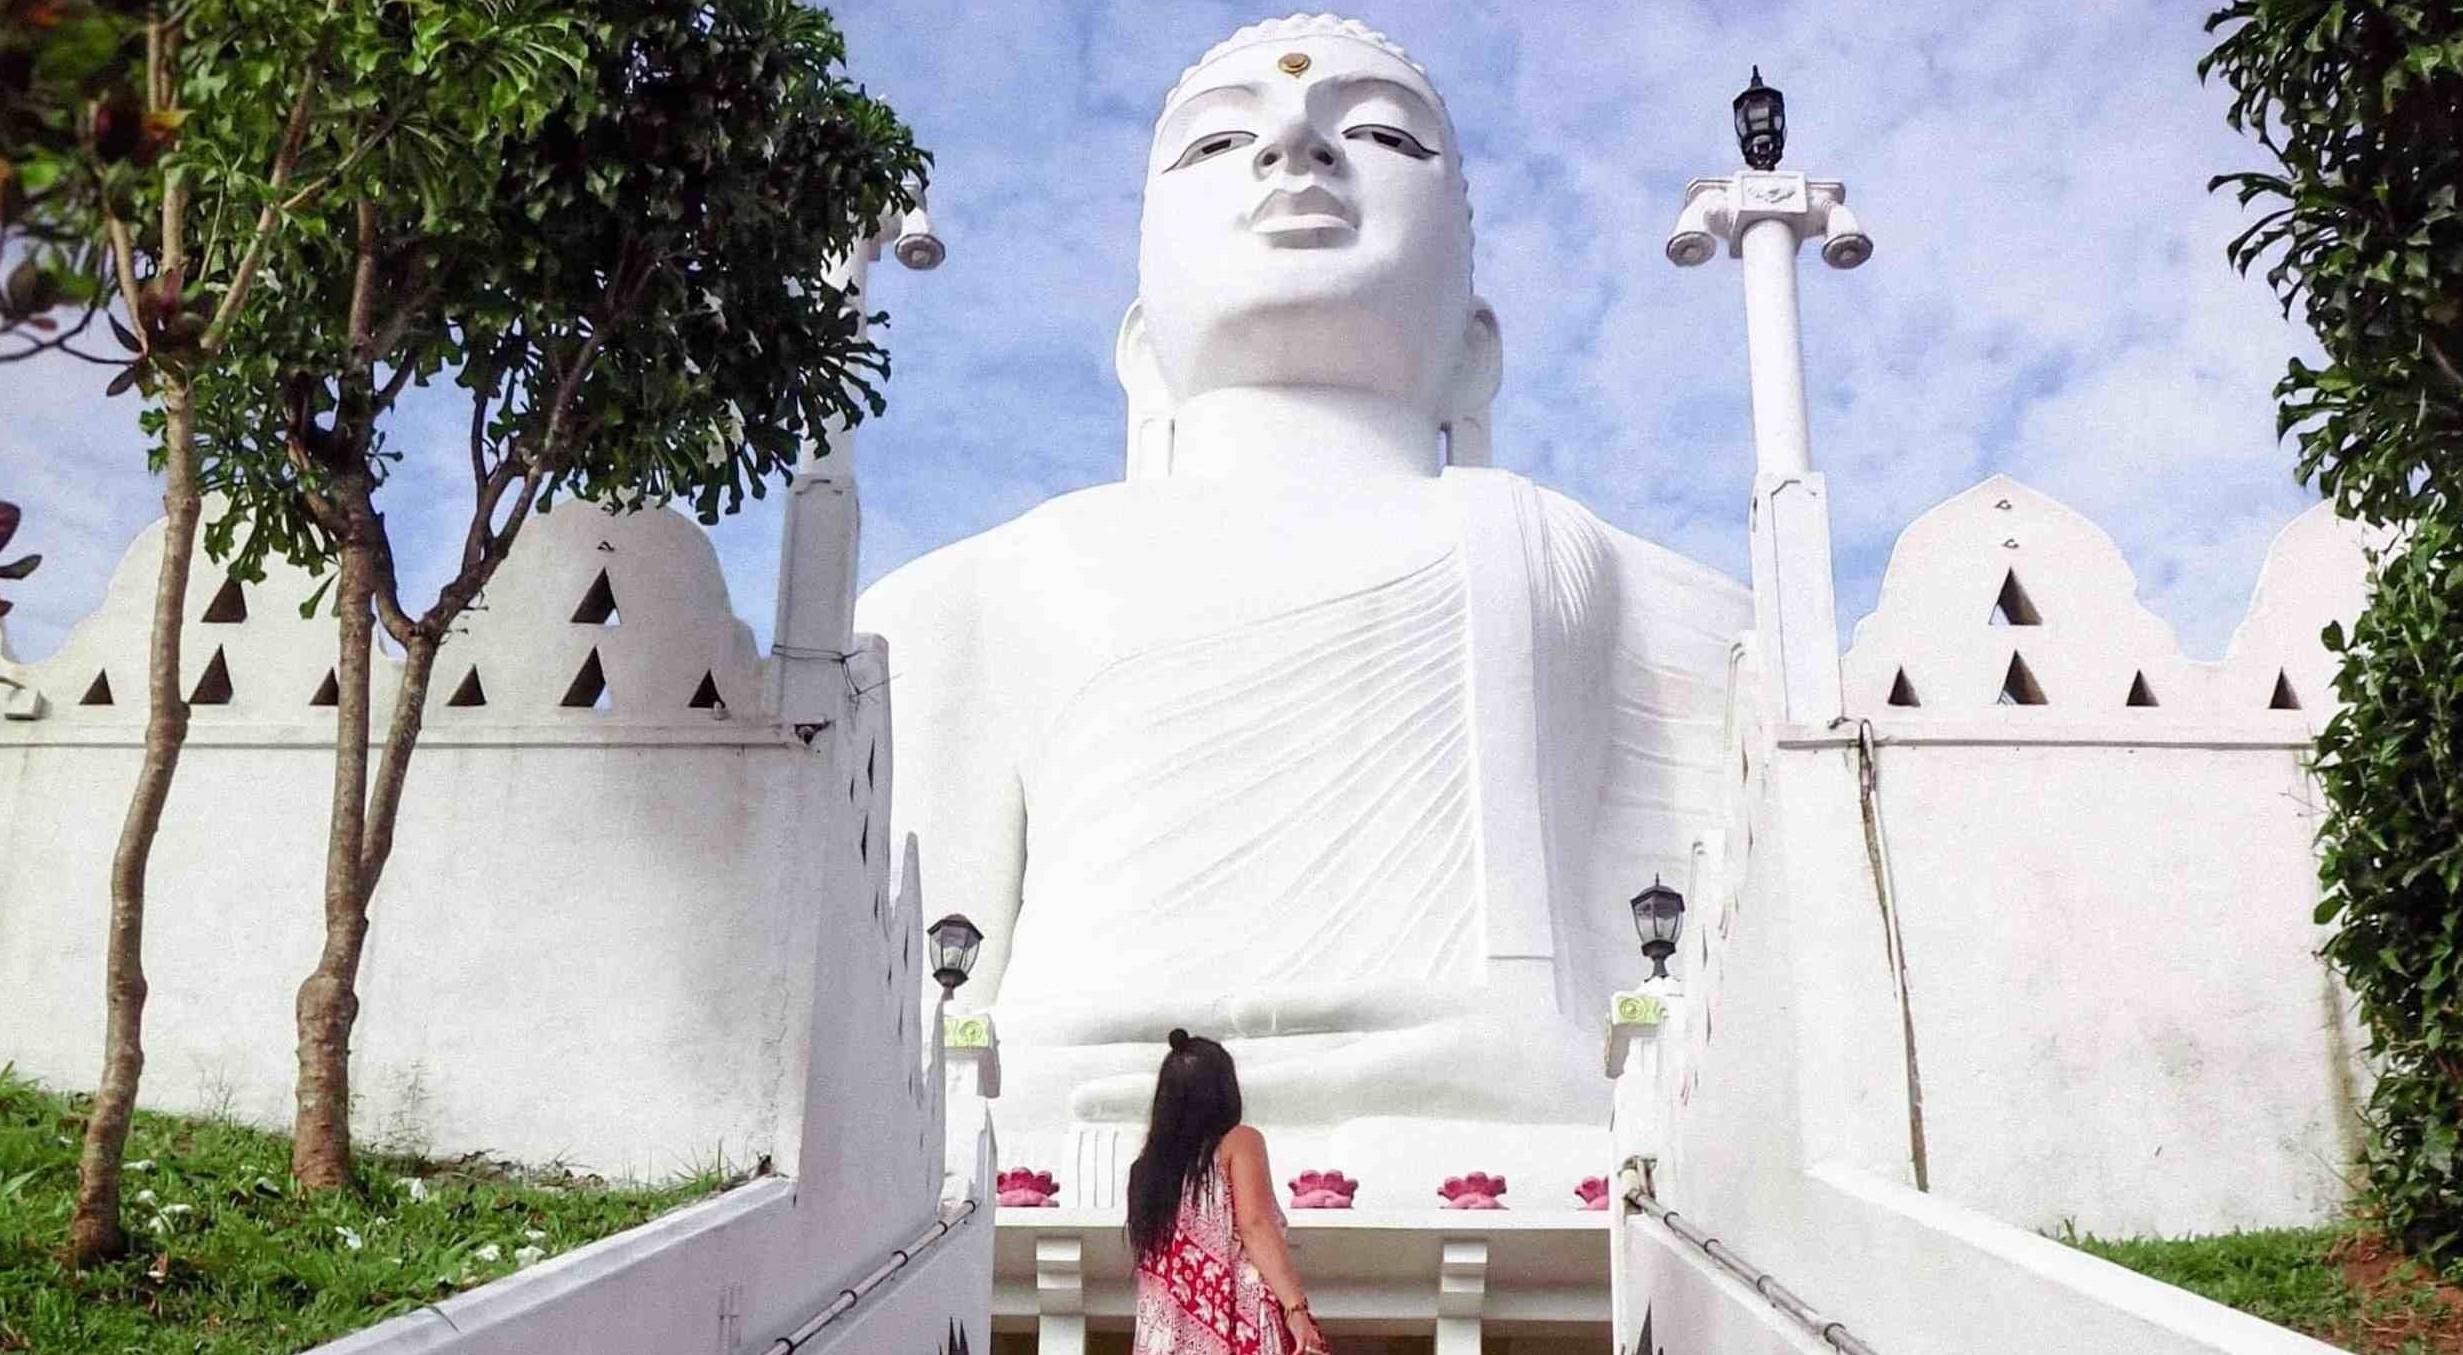 a-buddhist-monk-walks